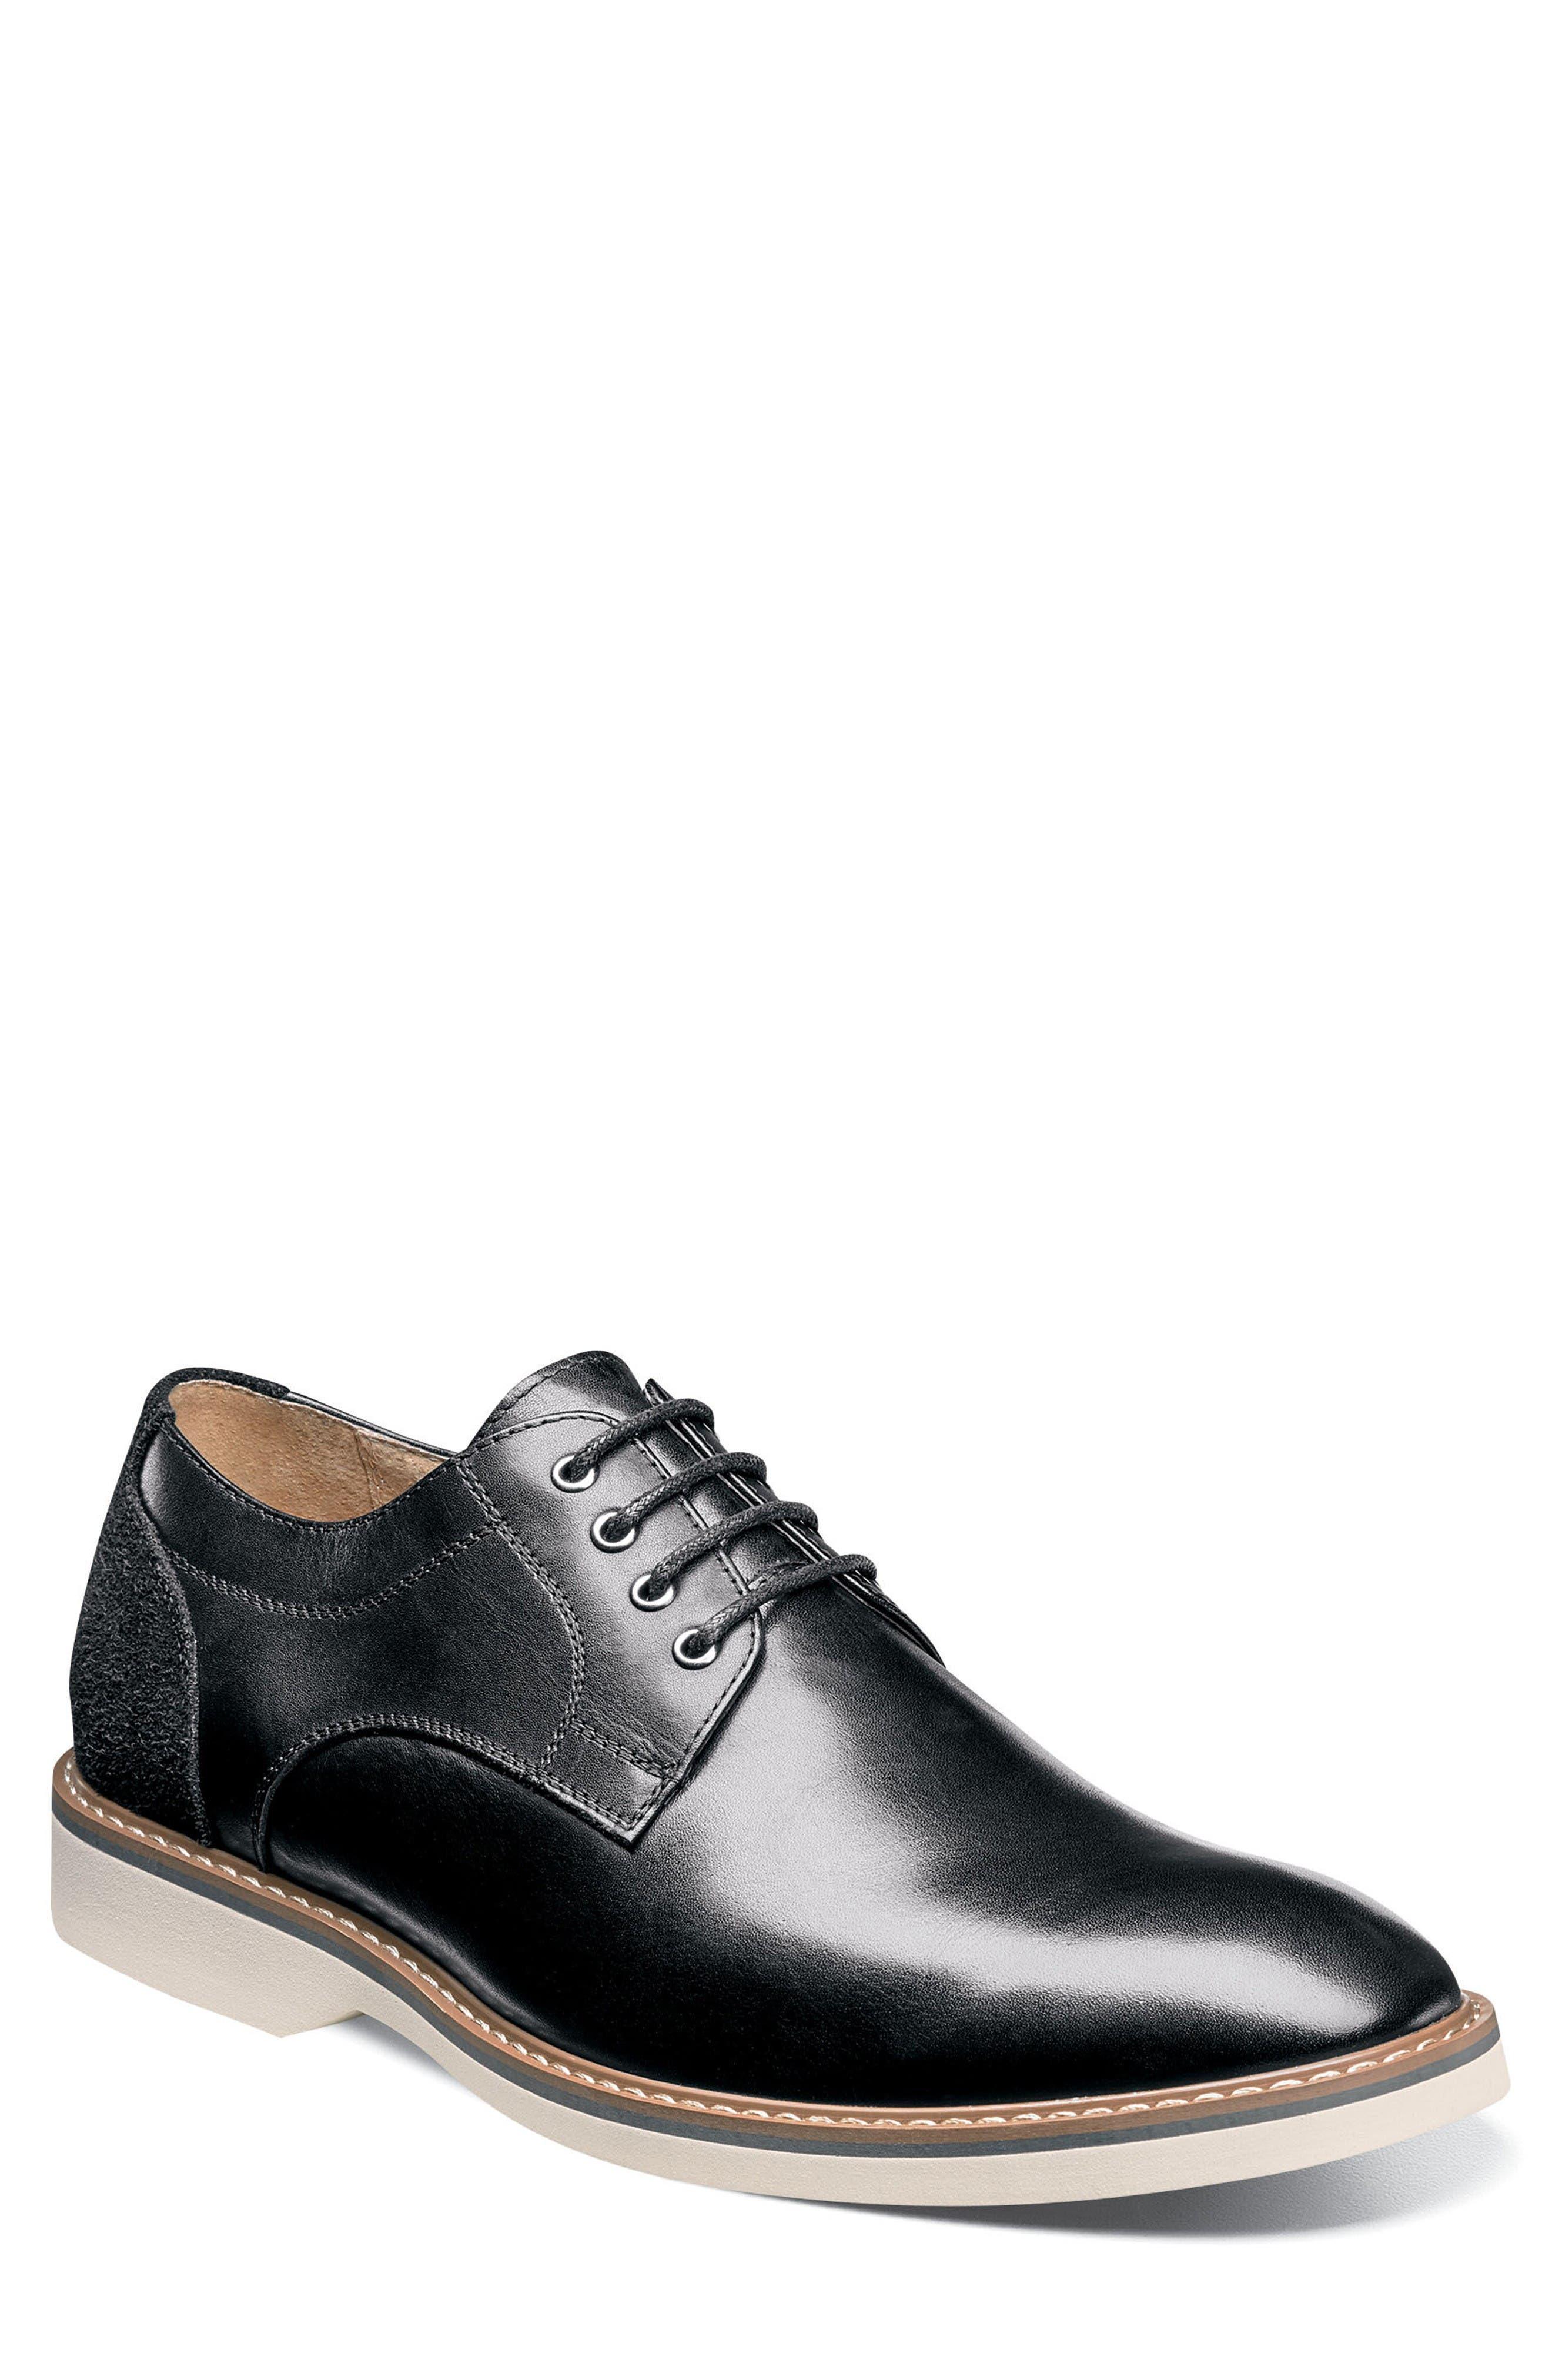 Alternate Image 1 Selected - Florsheim Union Buck Shoe (Men)